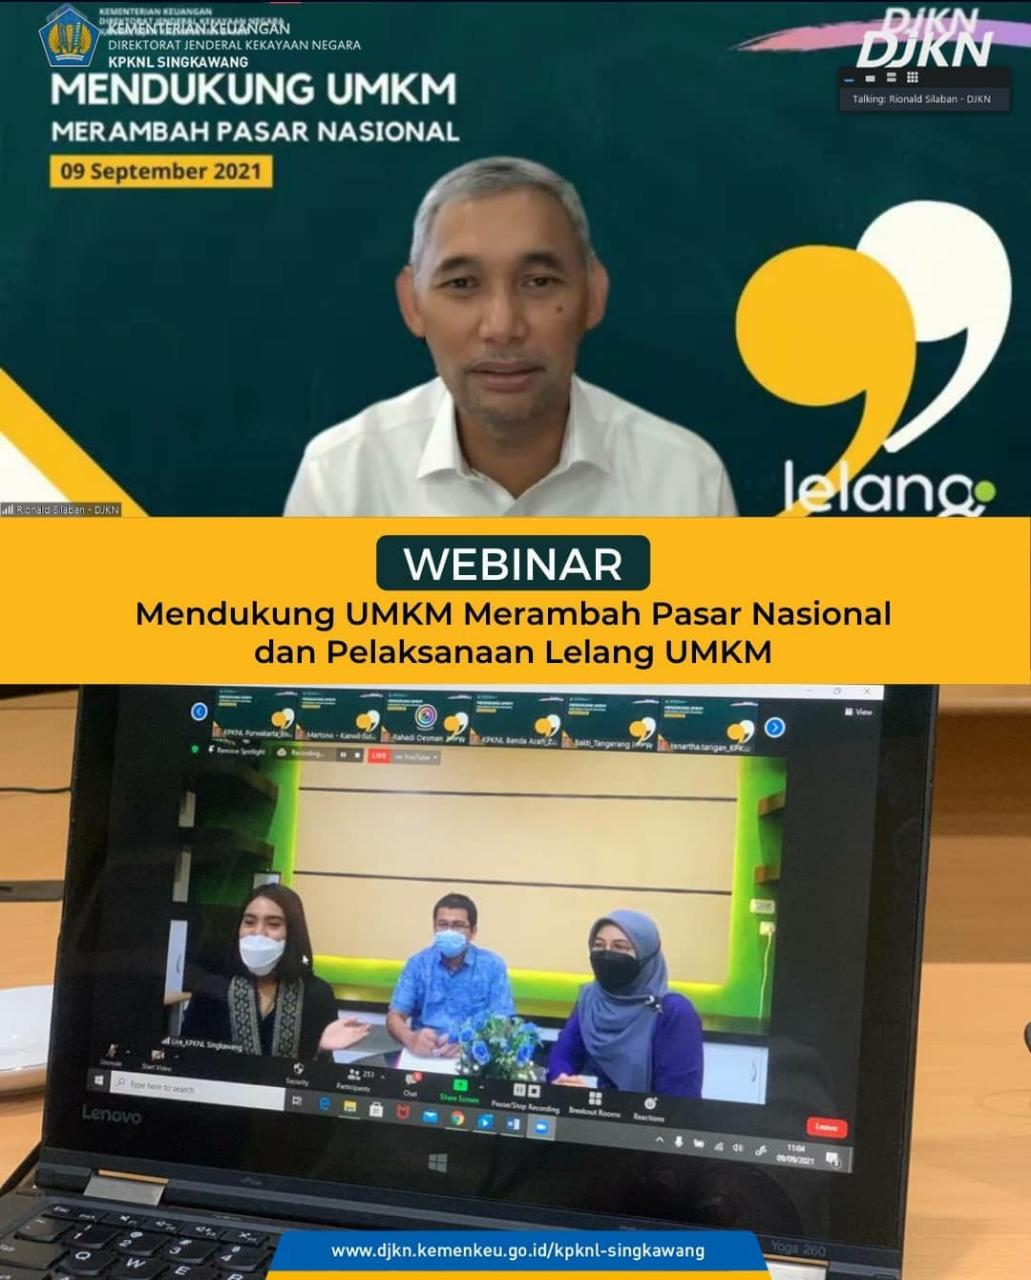 Dukung UMKM, KPKNL Singkawang dan DJKN Kalbar Laksanakan Webinar dan Live Lelang